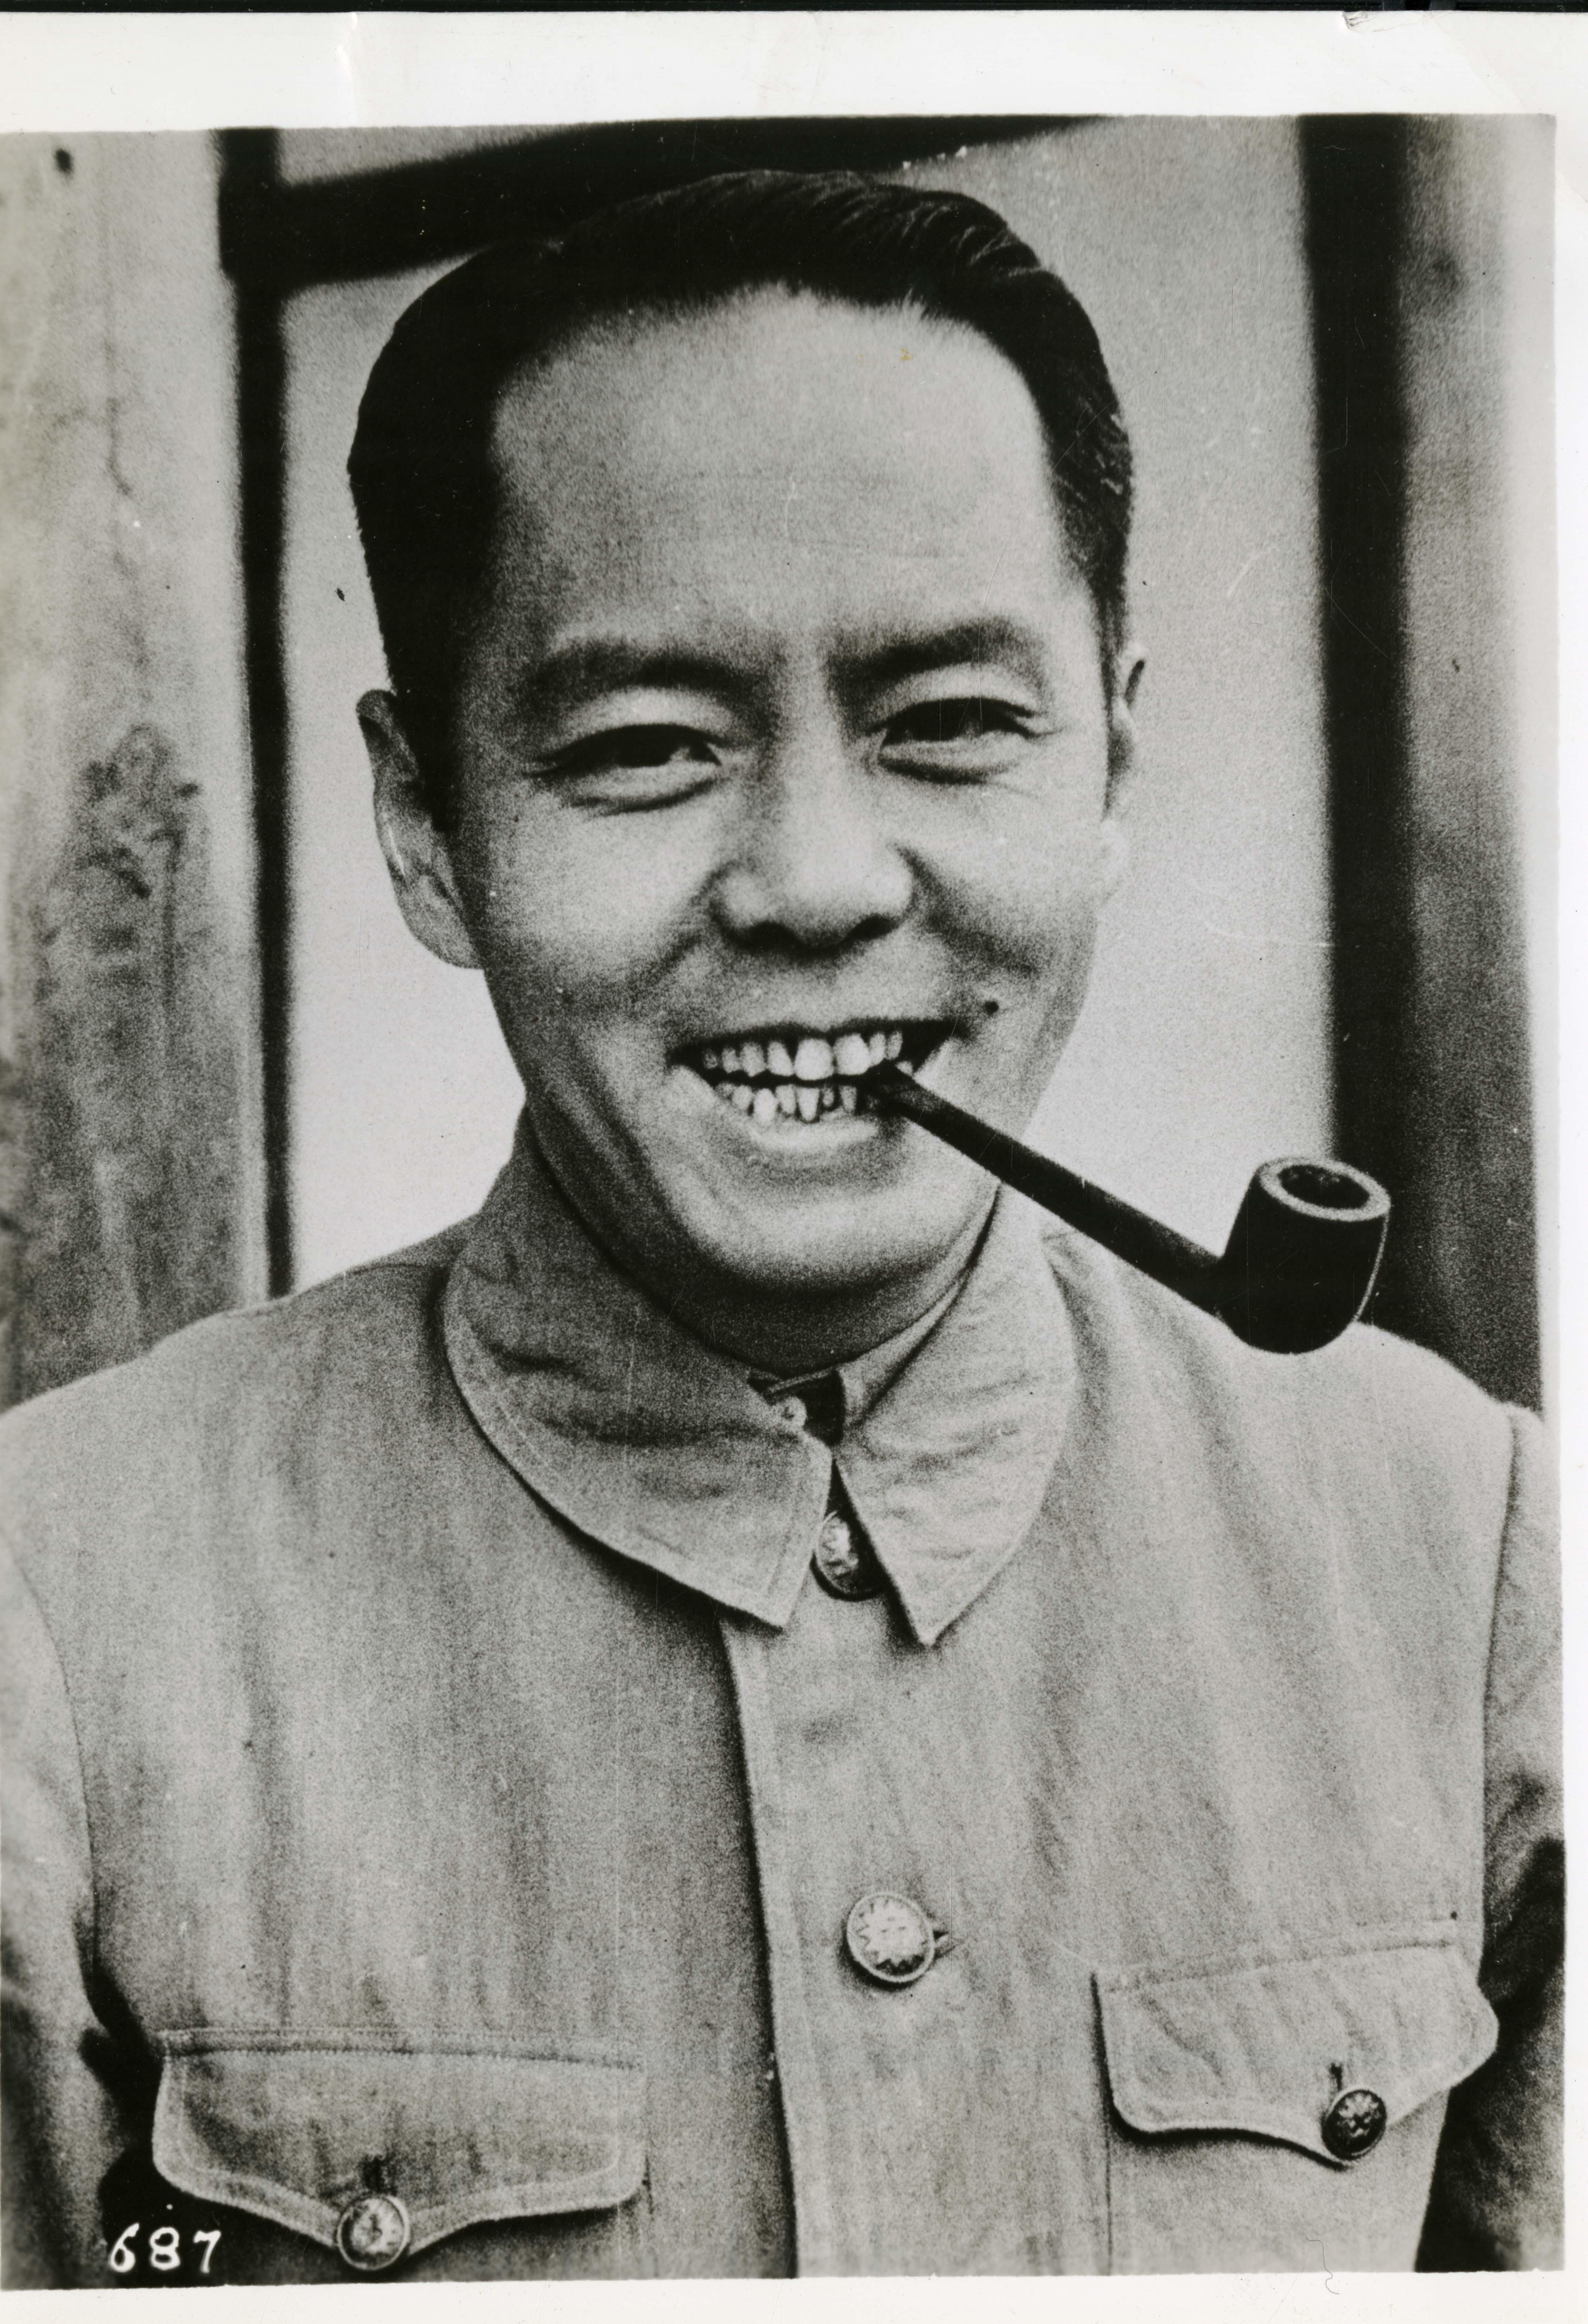 Dr. Robert Kho-Seng Lim